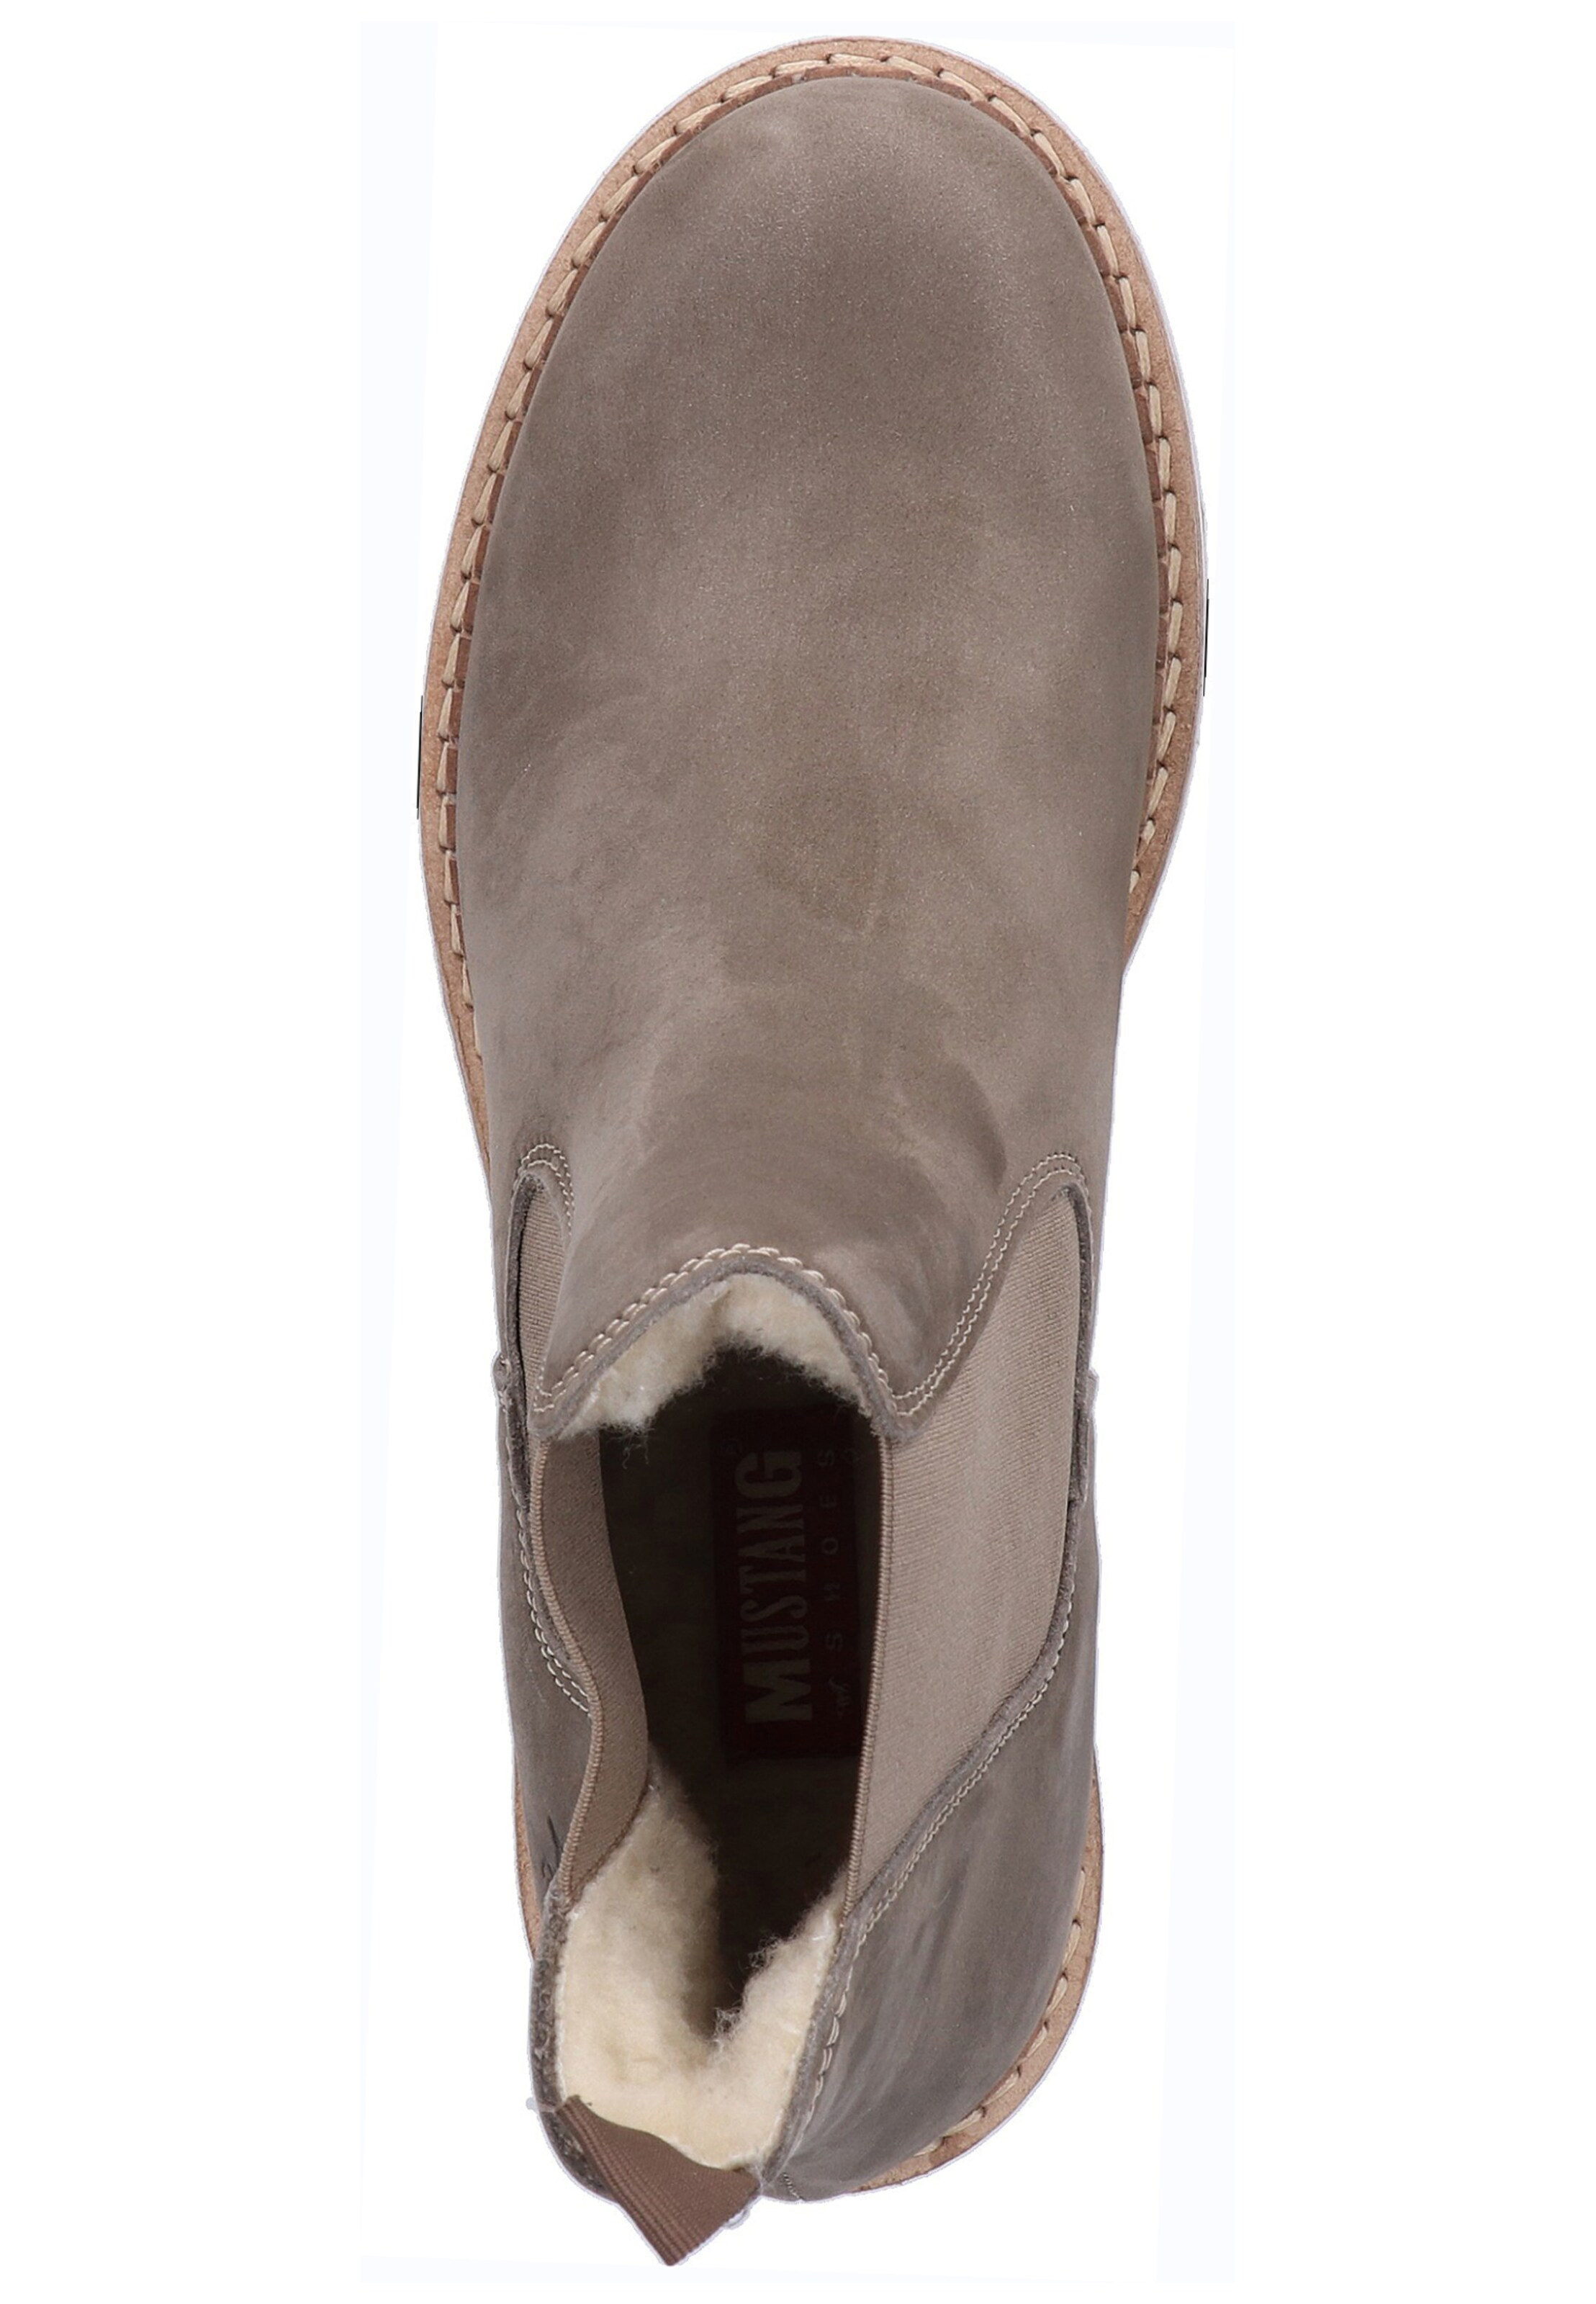 Taupe Boots Boots Chelsea Mustang En En Boots Chelsea Chelsea En Mustang Taupe Mustang cAq5R4j3L